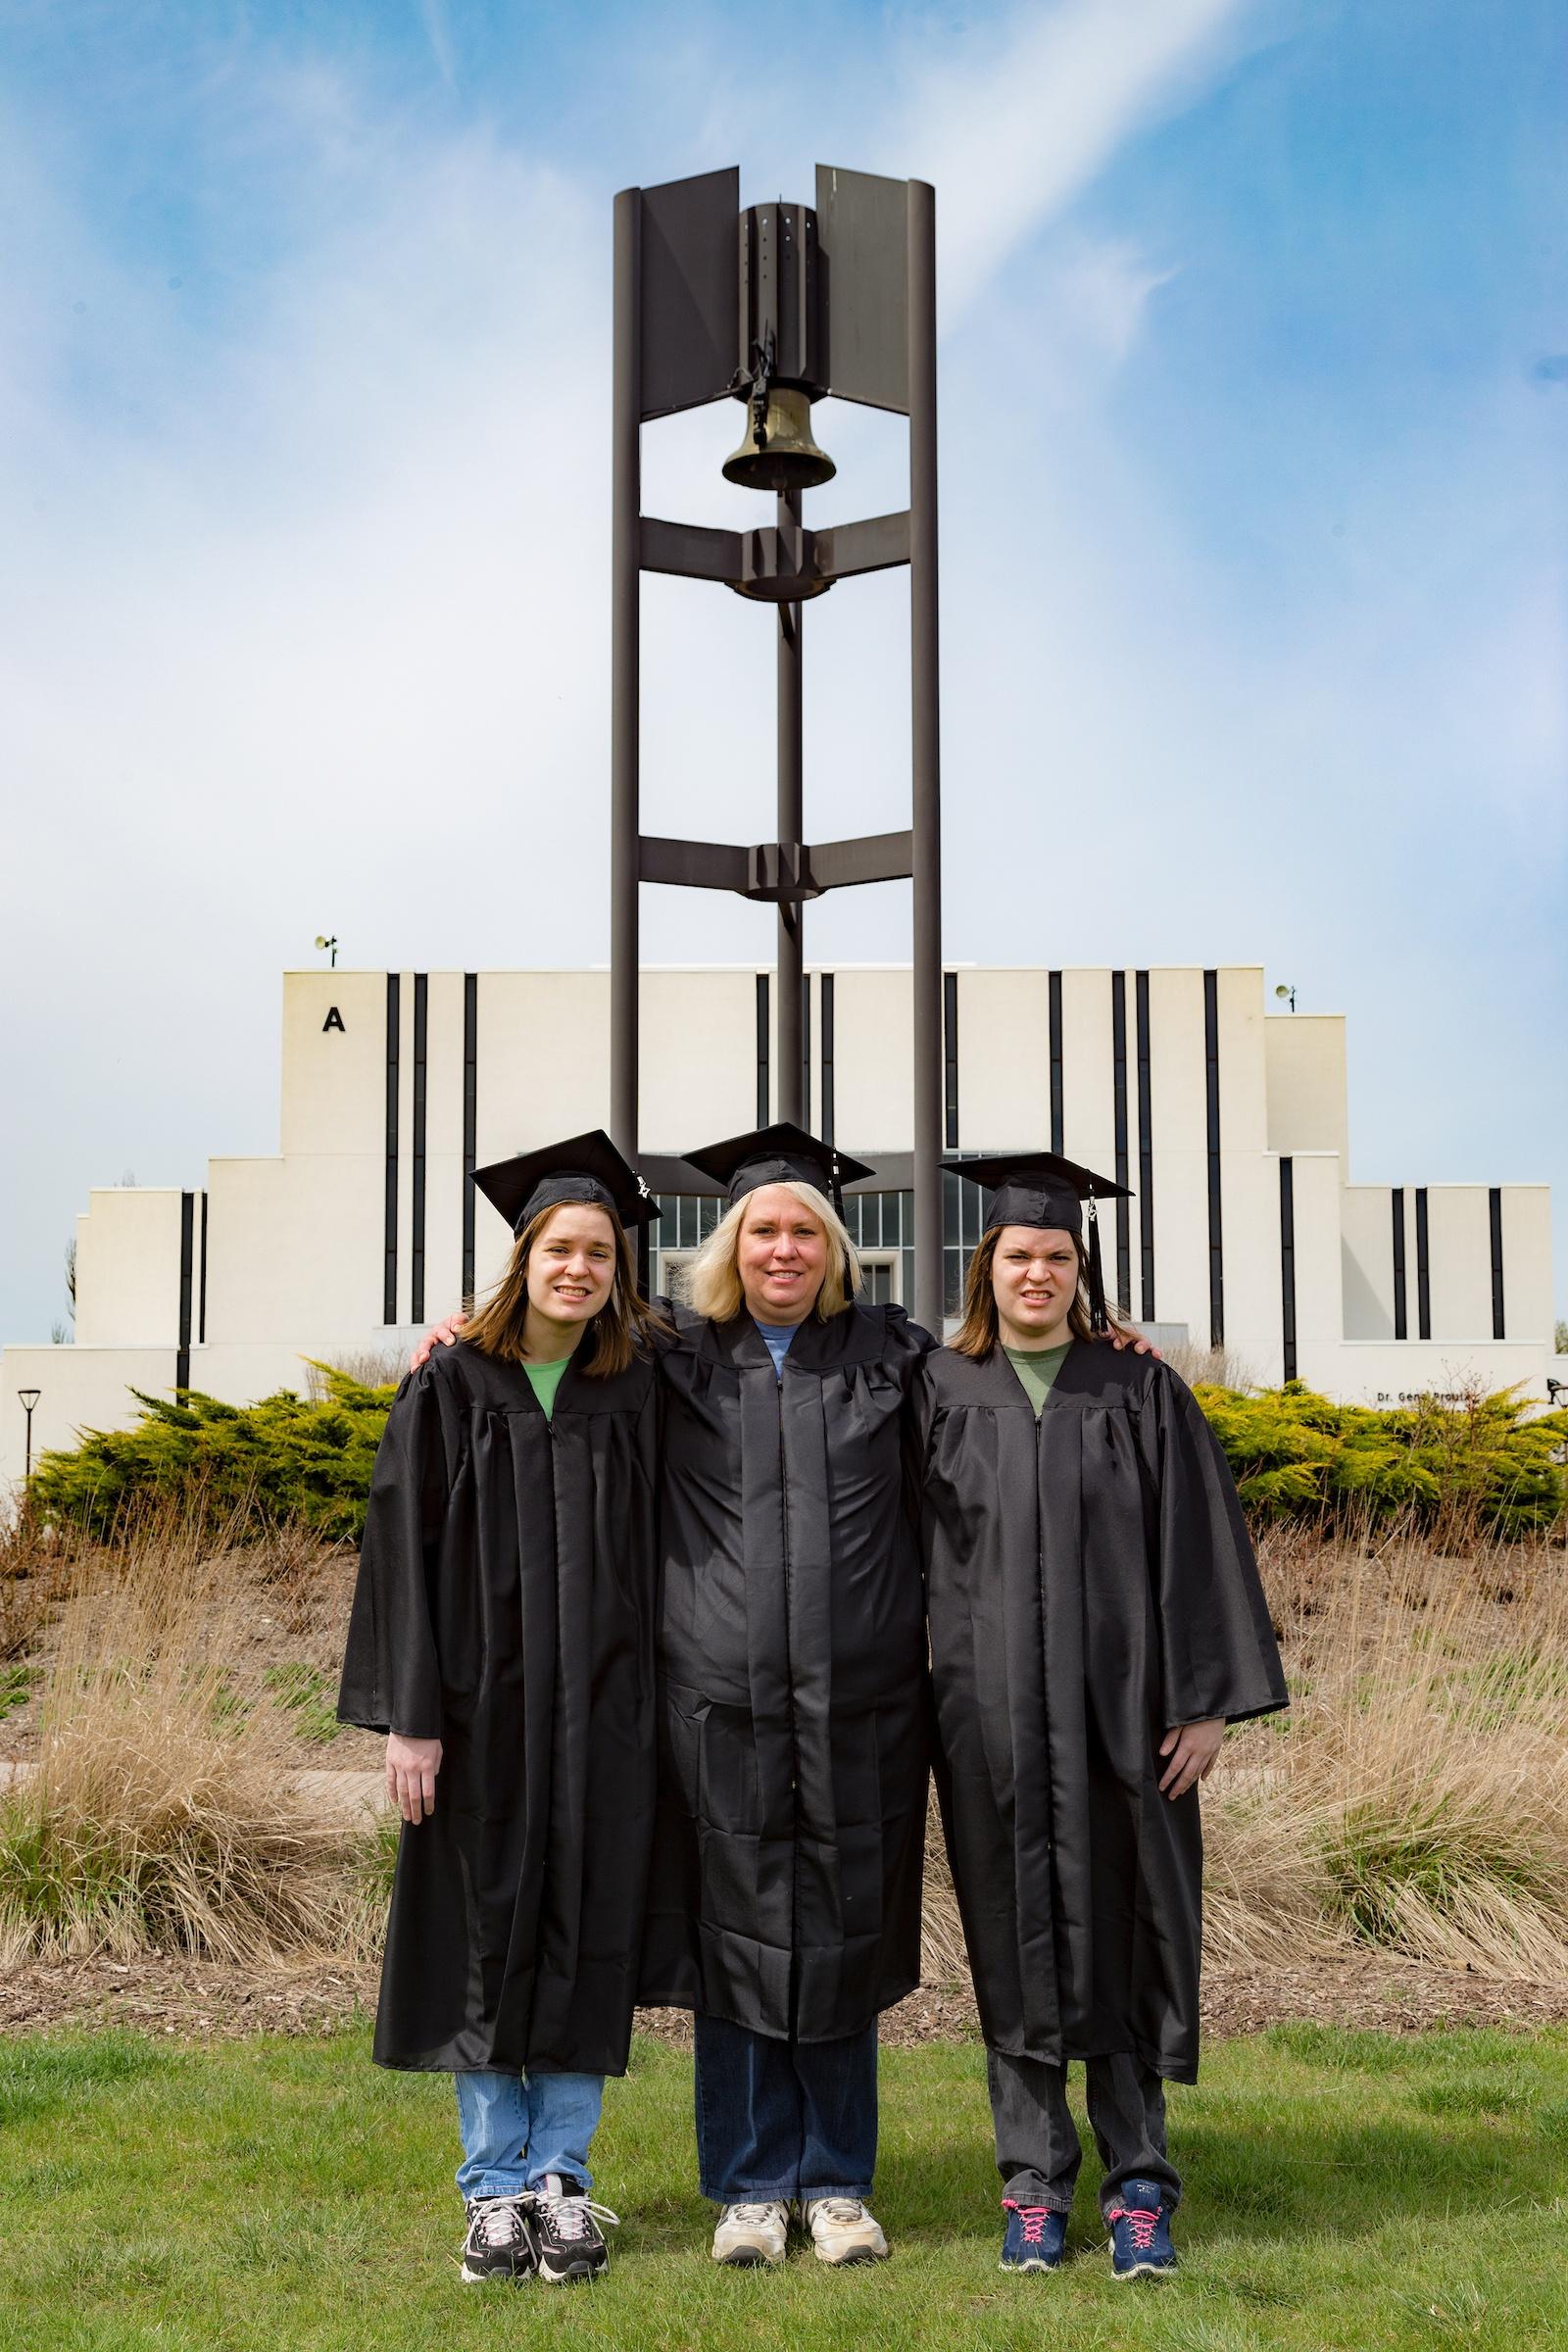 Q&A: The Bopp Family Shares Their Unique Graduation Story Amanda Ashley Audrey bell tower campus center